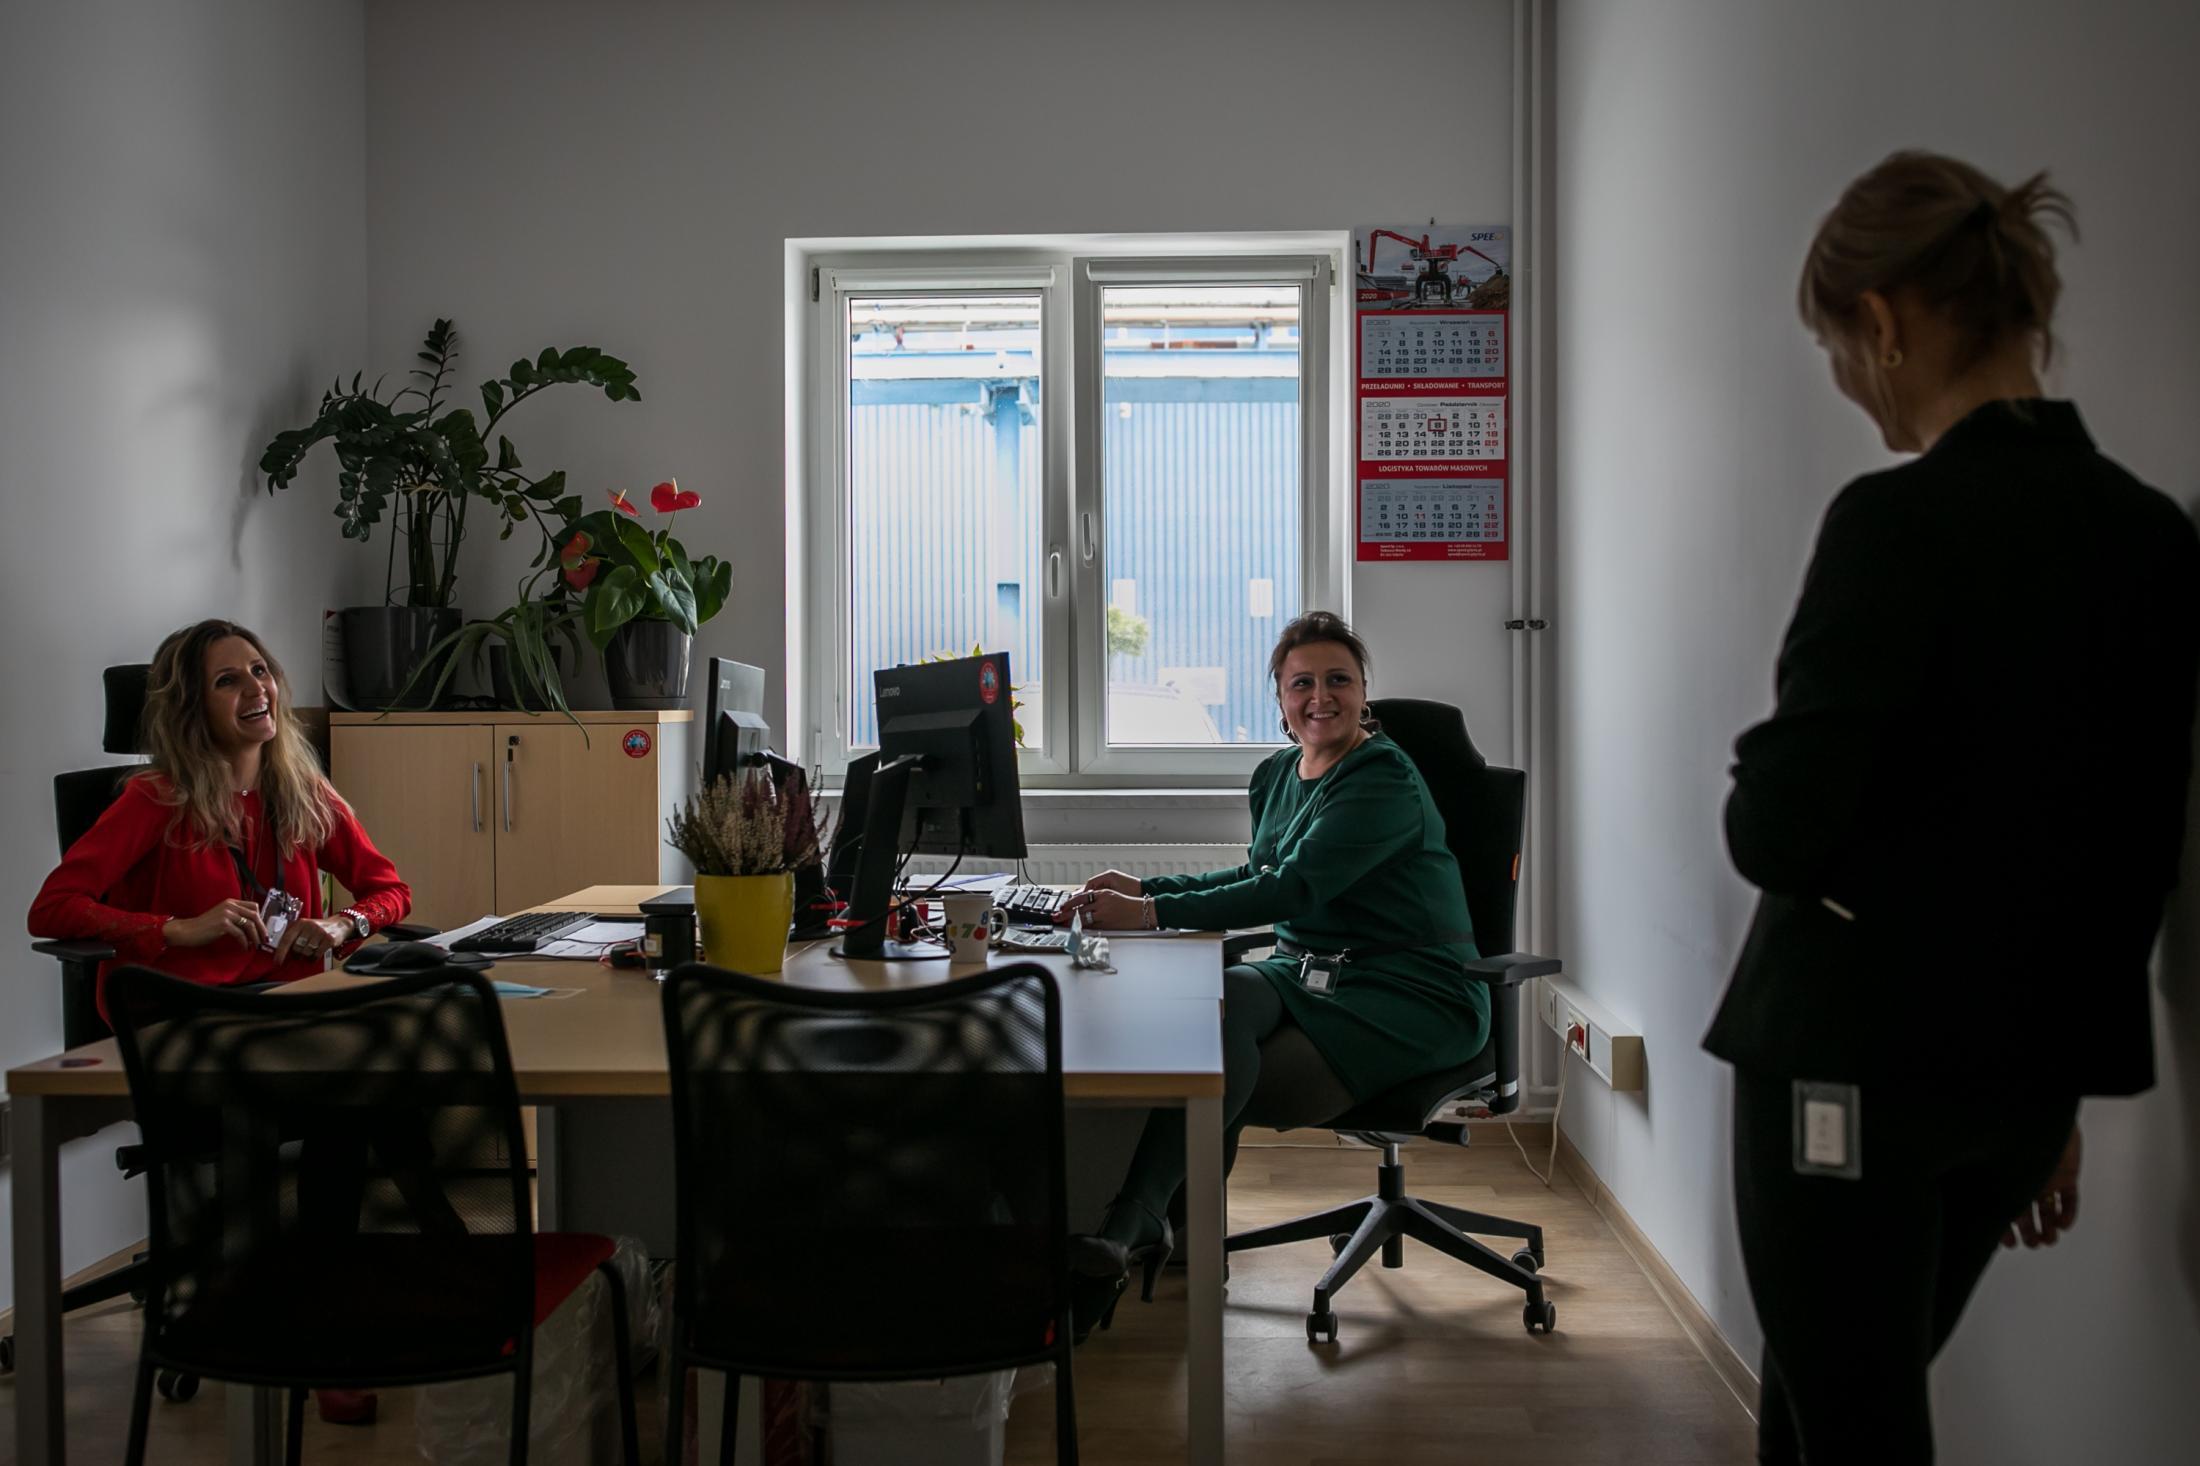 2020 Henkel plant, Raciborz, Poland. SafeZone-digital social distancing technology Henkel is using to prevent the spread of corona.